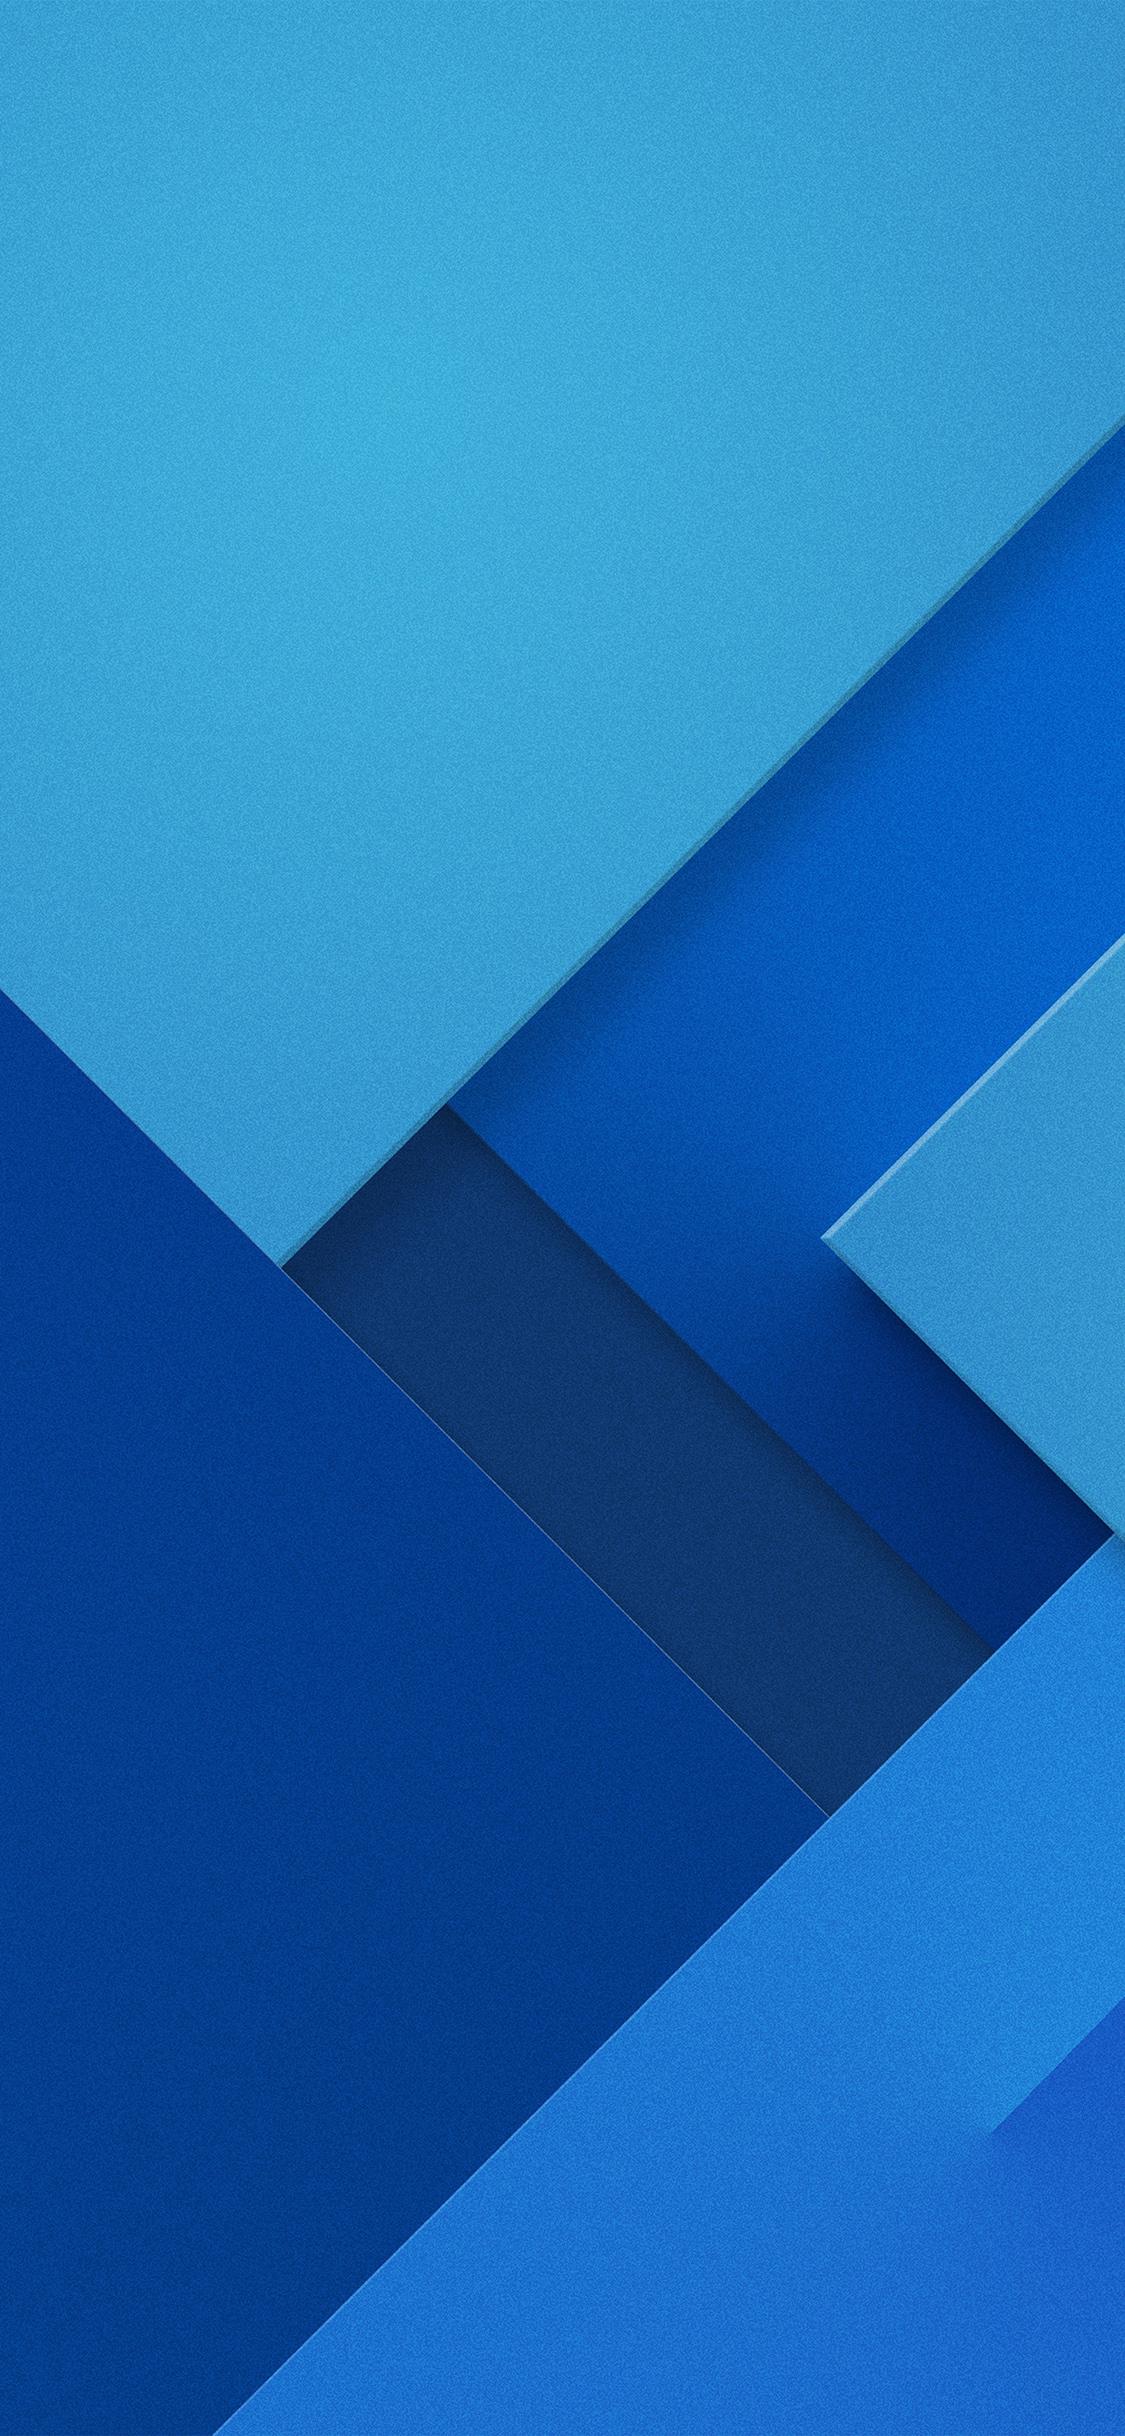 Vo18 Samsung Galaxy 7 Edge Blue Abstract Pattern Wallpaper